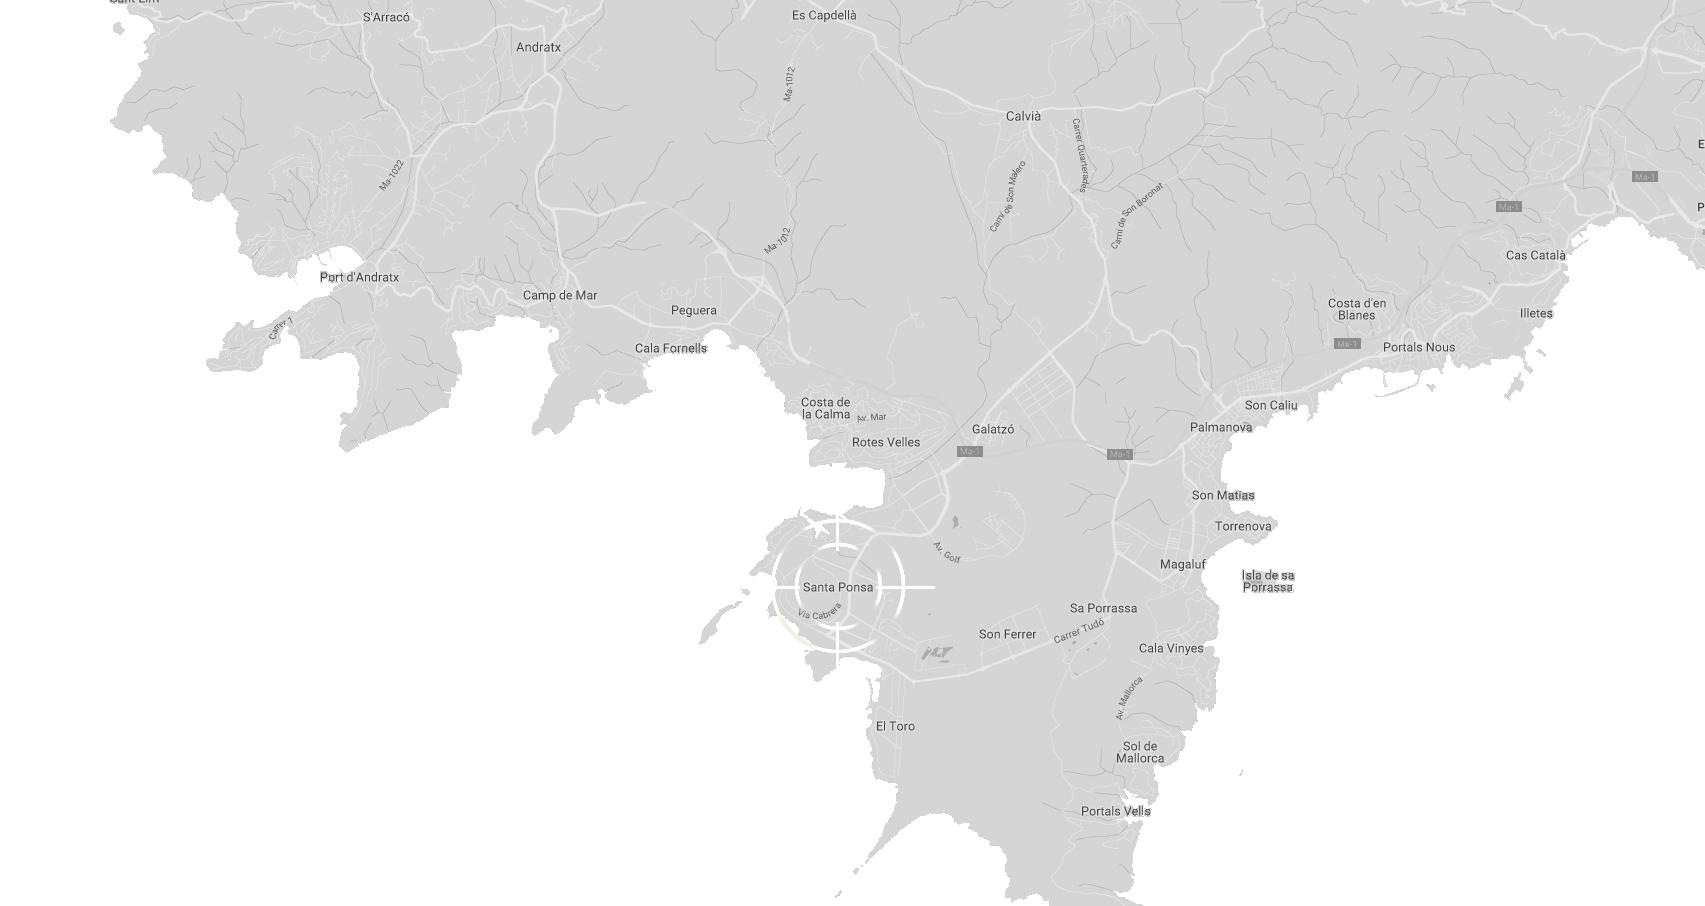 Santa Ponsa on map